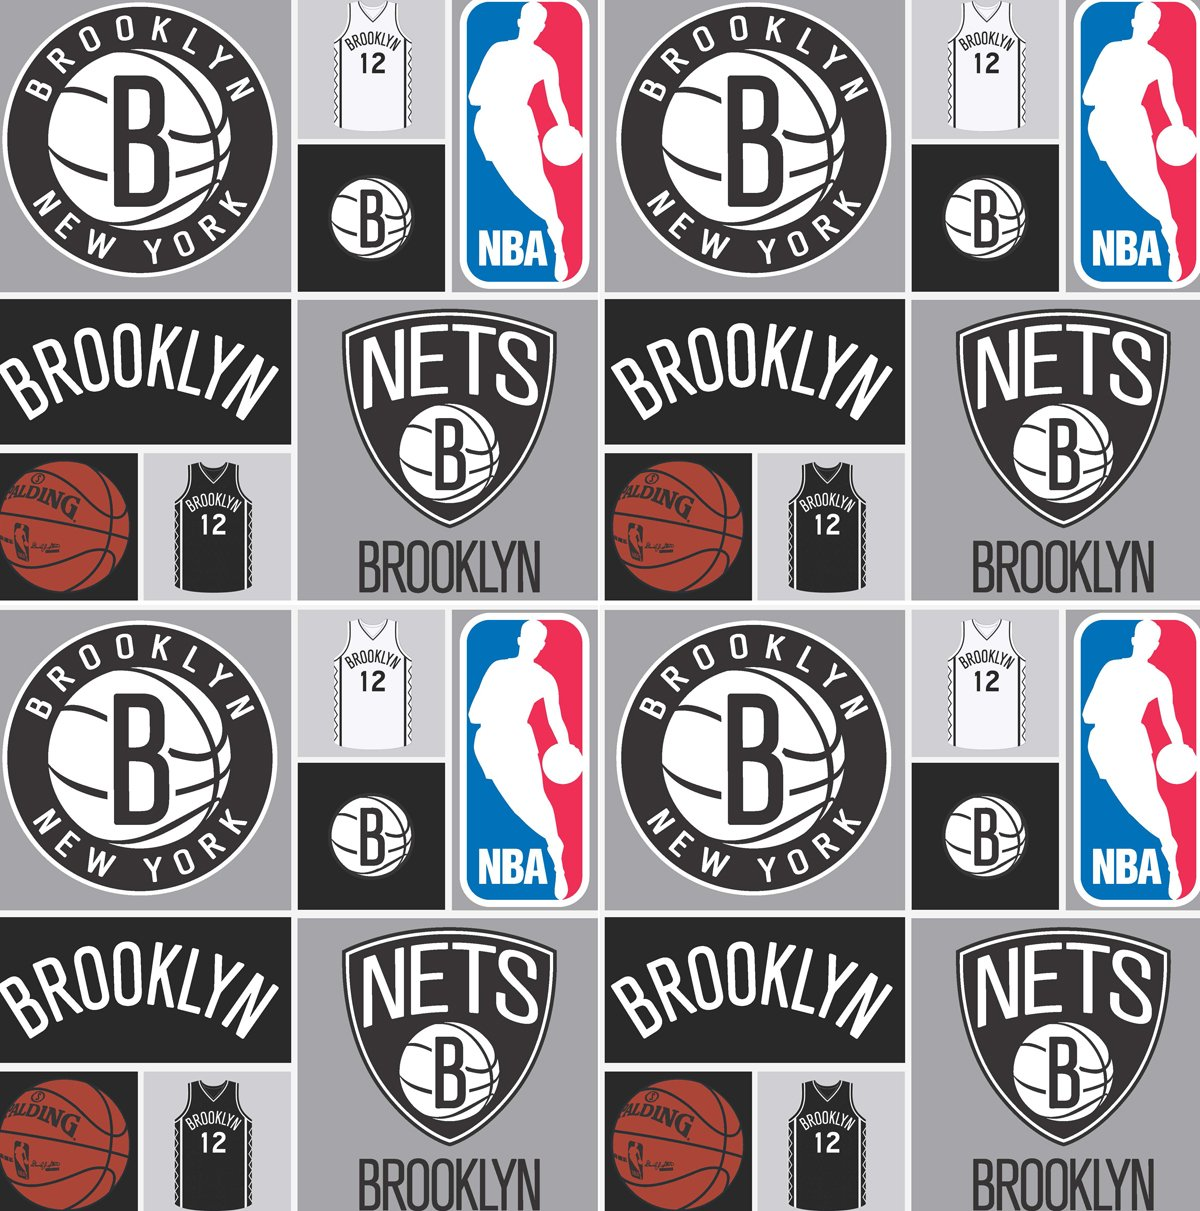 NBA Brooklyn Nets 083 Grey/Black